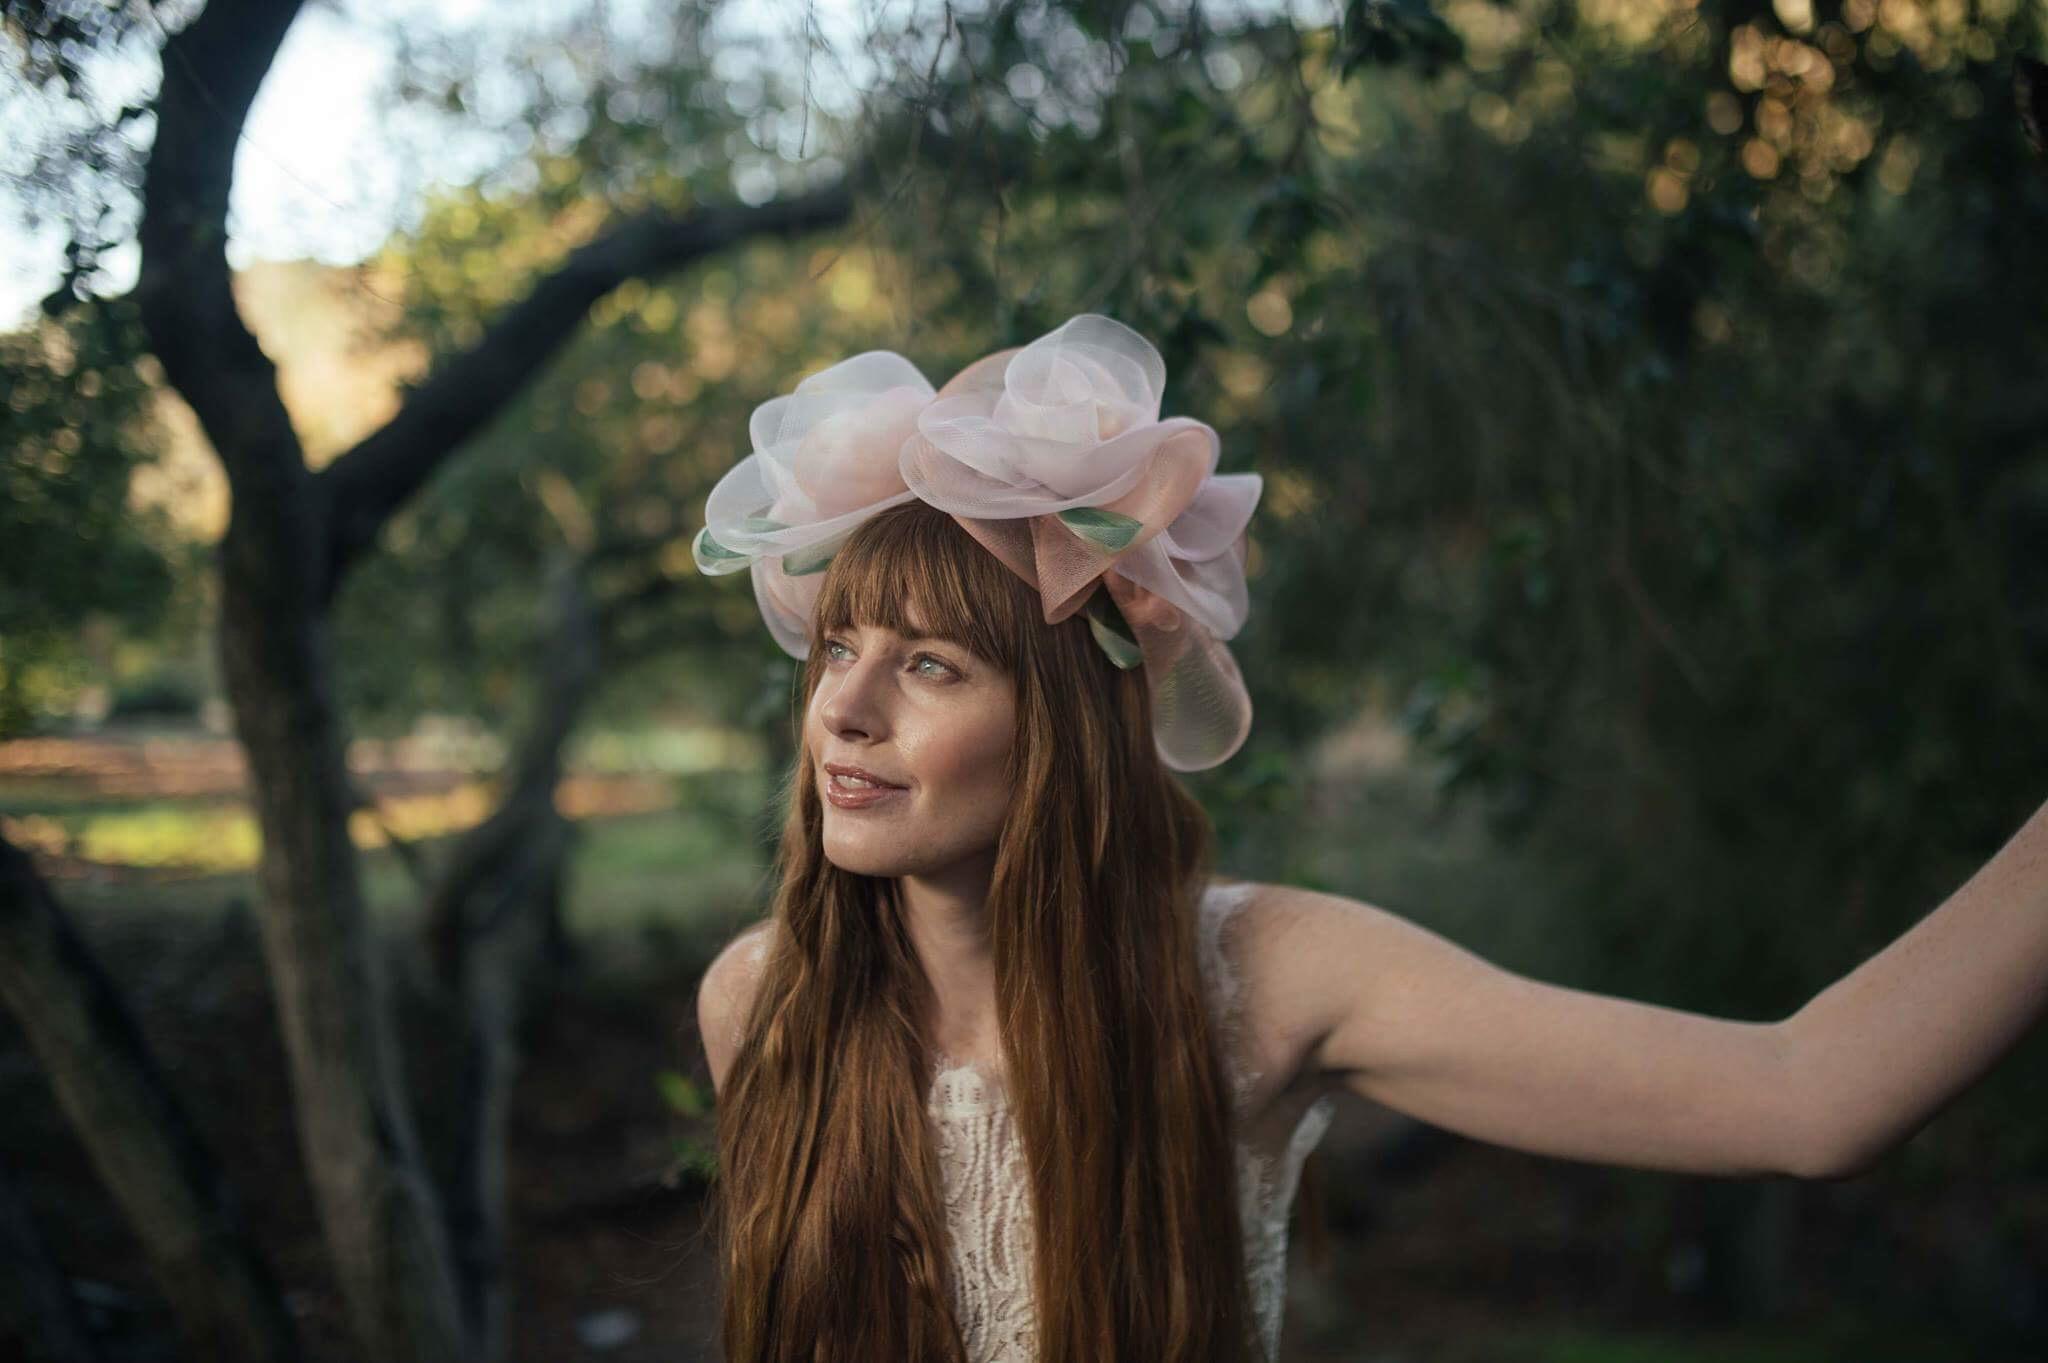 "Corina Haywood Hats Crinoline Flower Fairy Crown ""Rose""                                                                                                           Model:Raeshae Shane - Photographer: Tian Liu - Makeup Artist:Thirati K Kulyingwattanavit -Hair Stylist:Shawnt'a Johns"